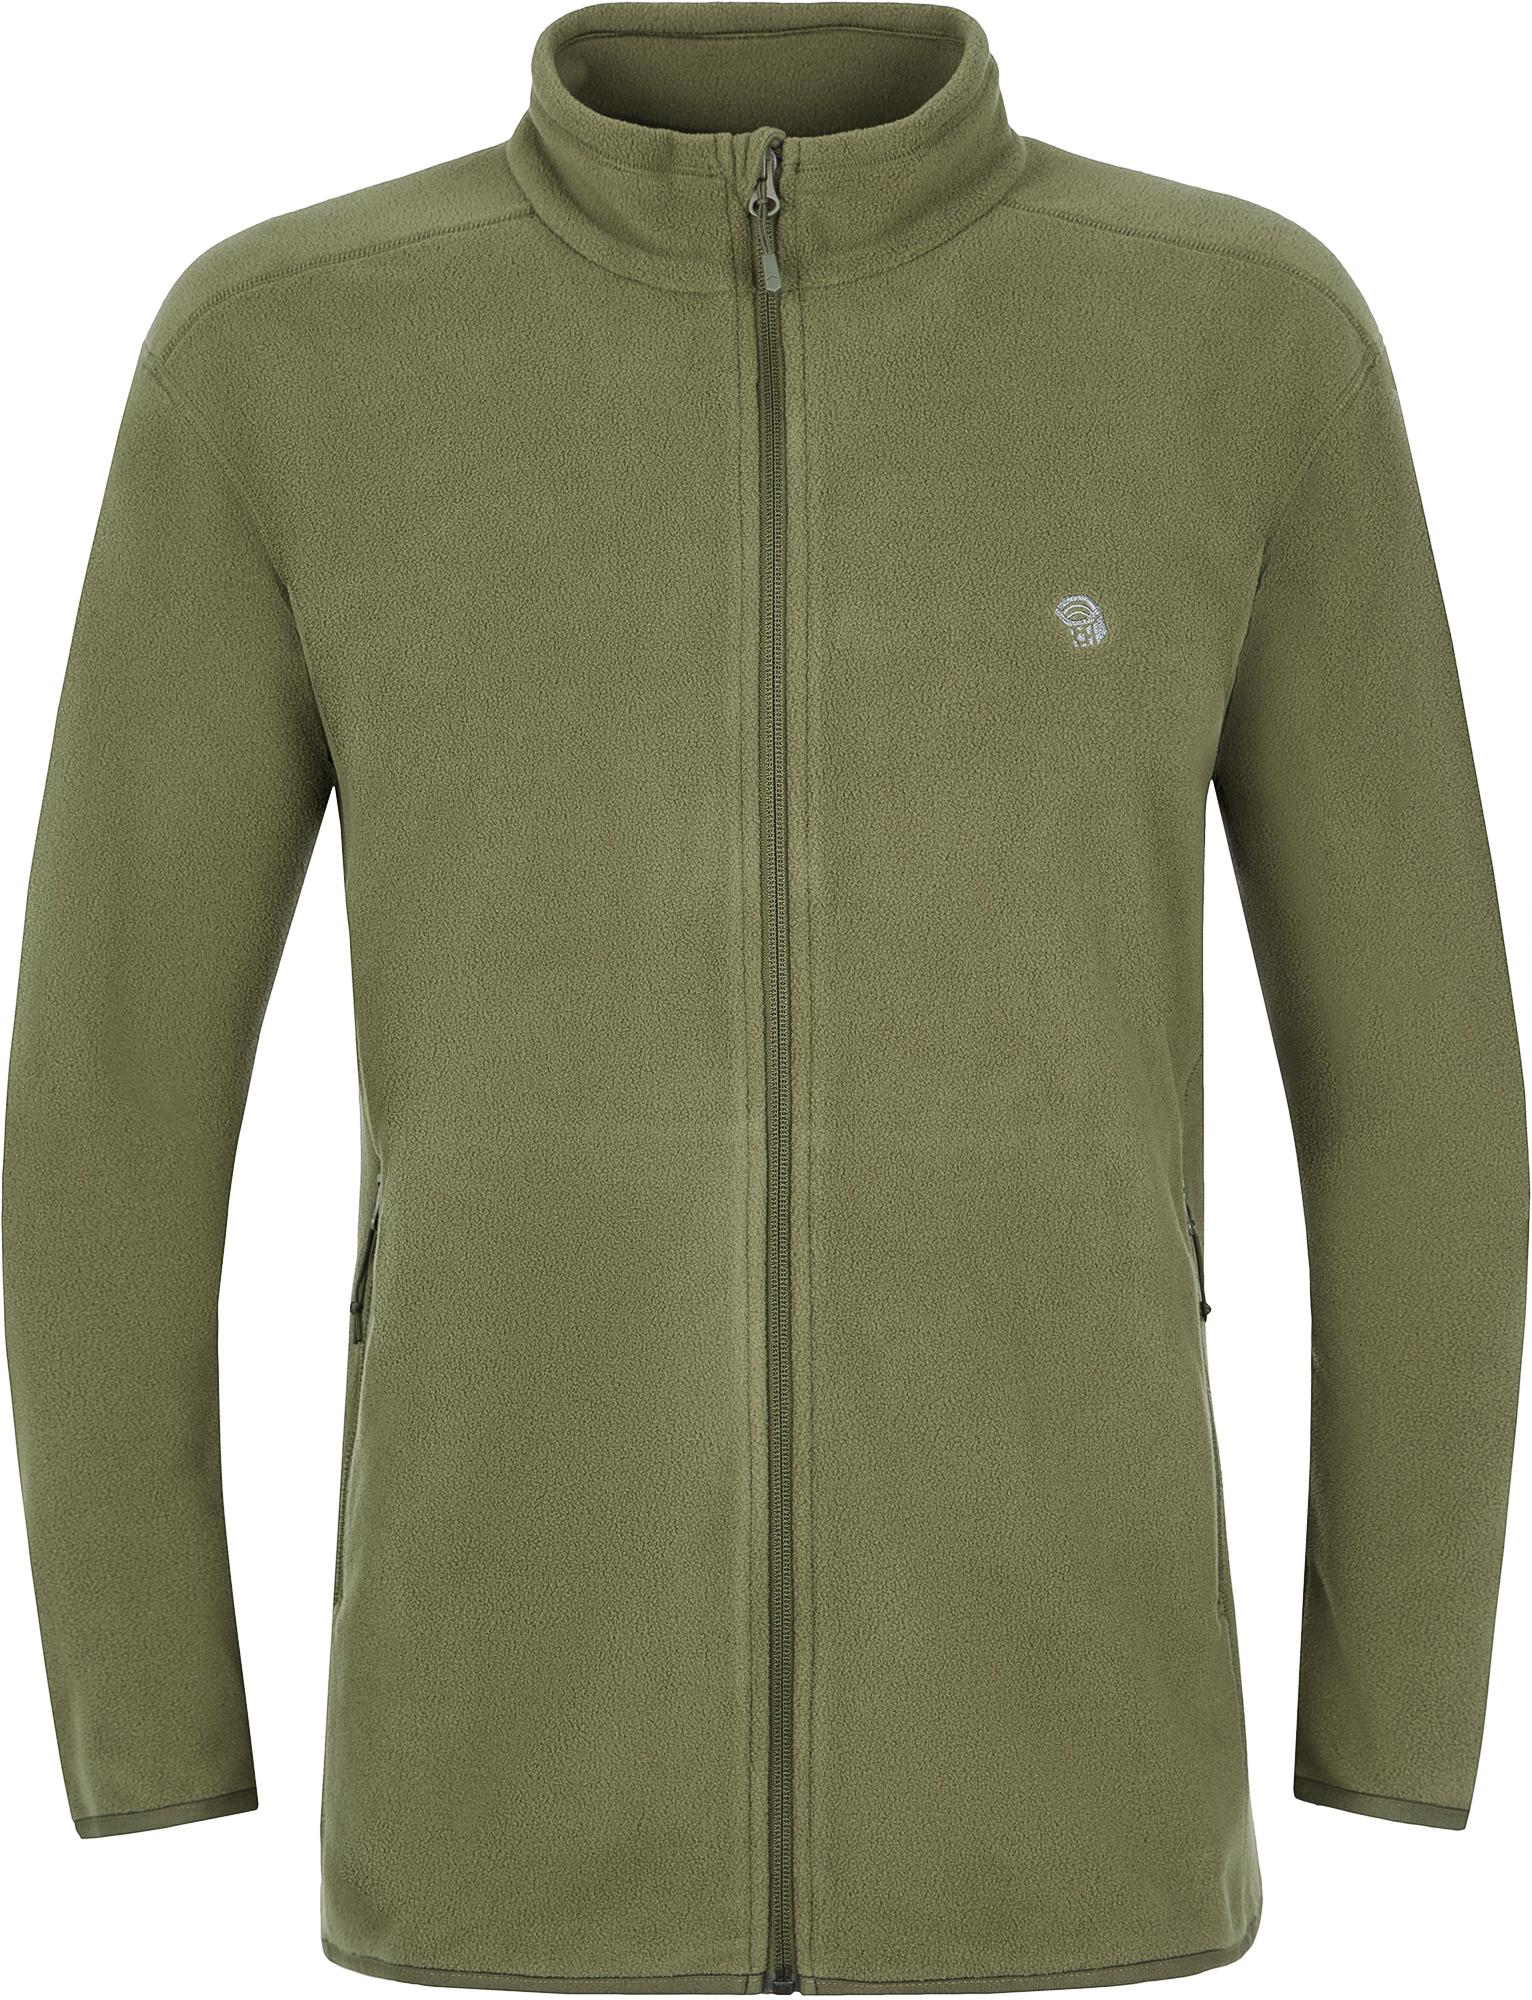 Mountain Hardwear Джемпер флисовый мужской Mountain Hardwear Macrochill™, размер 48 цена в Москве и Питере